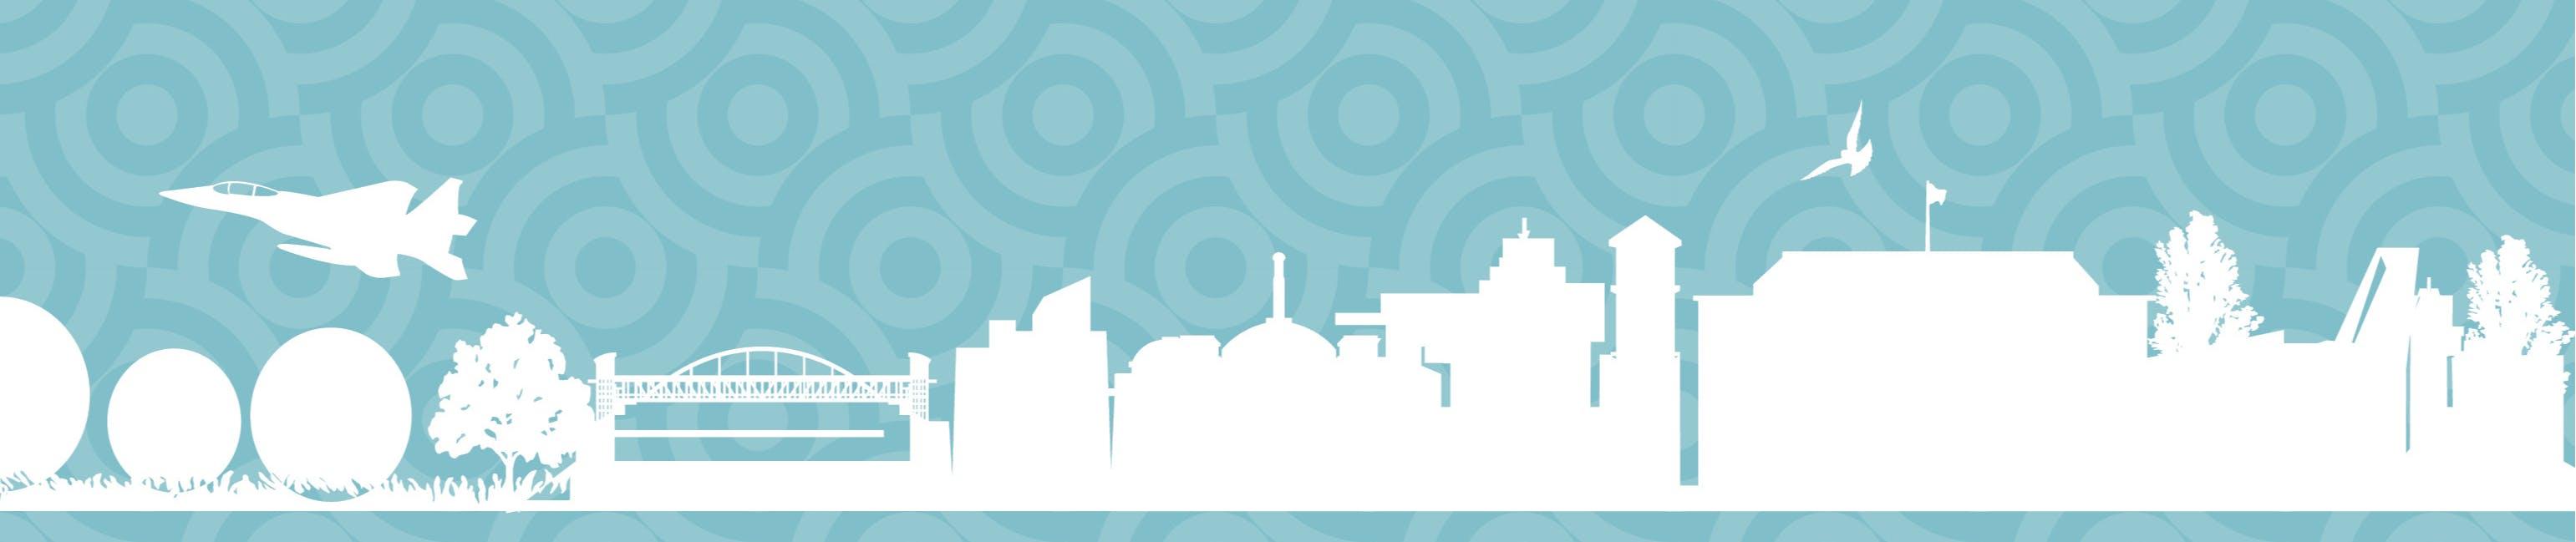 Illustration of various city of Aurora landmarks